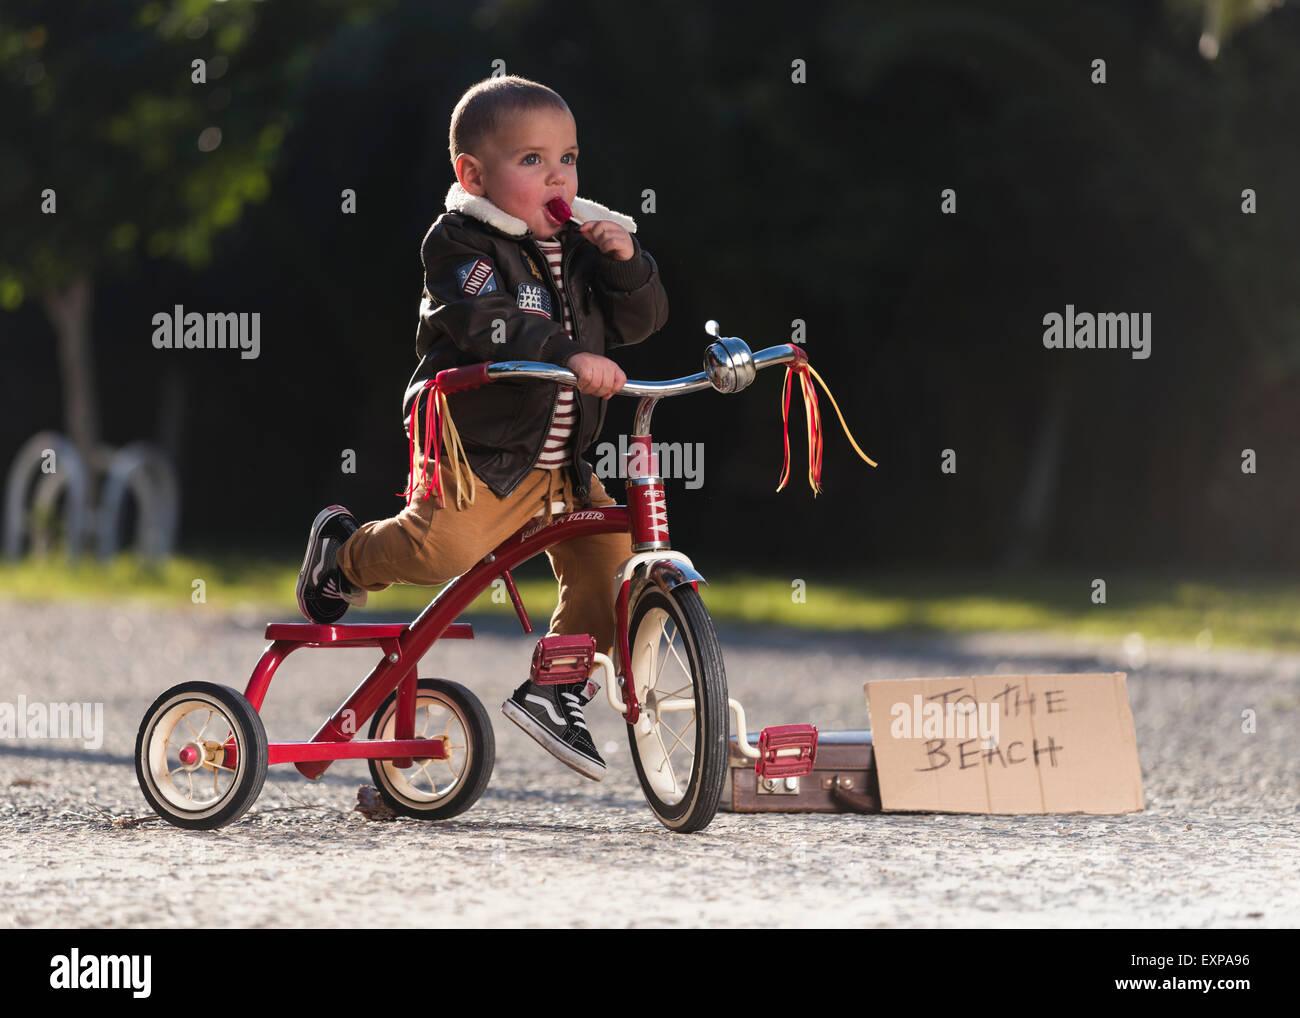 Jeune garçon sur son vélo. Photo Stock